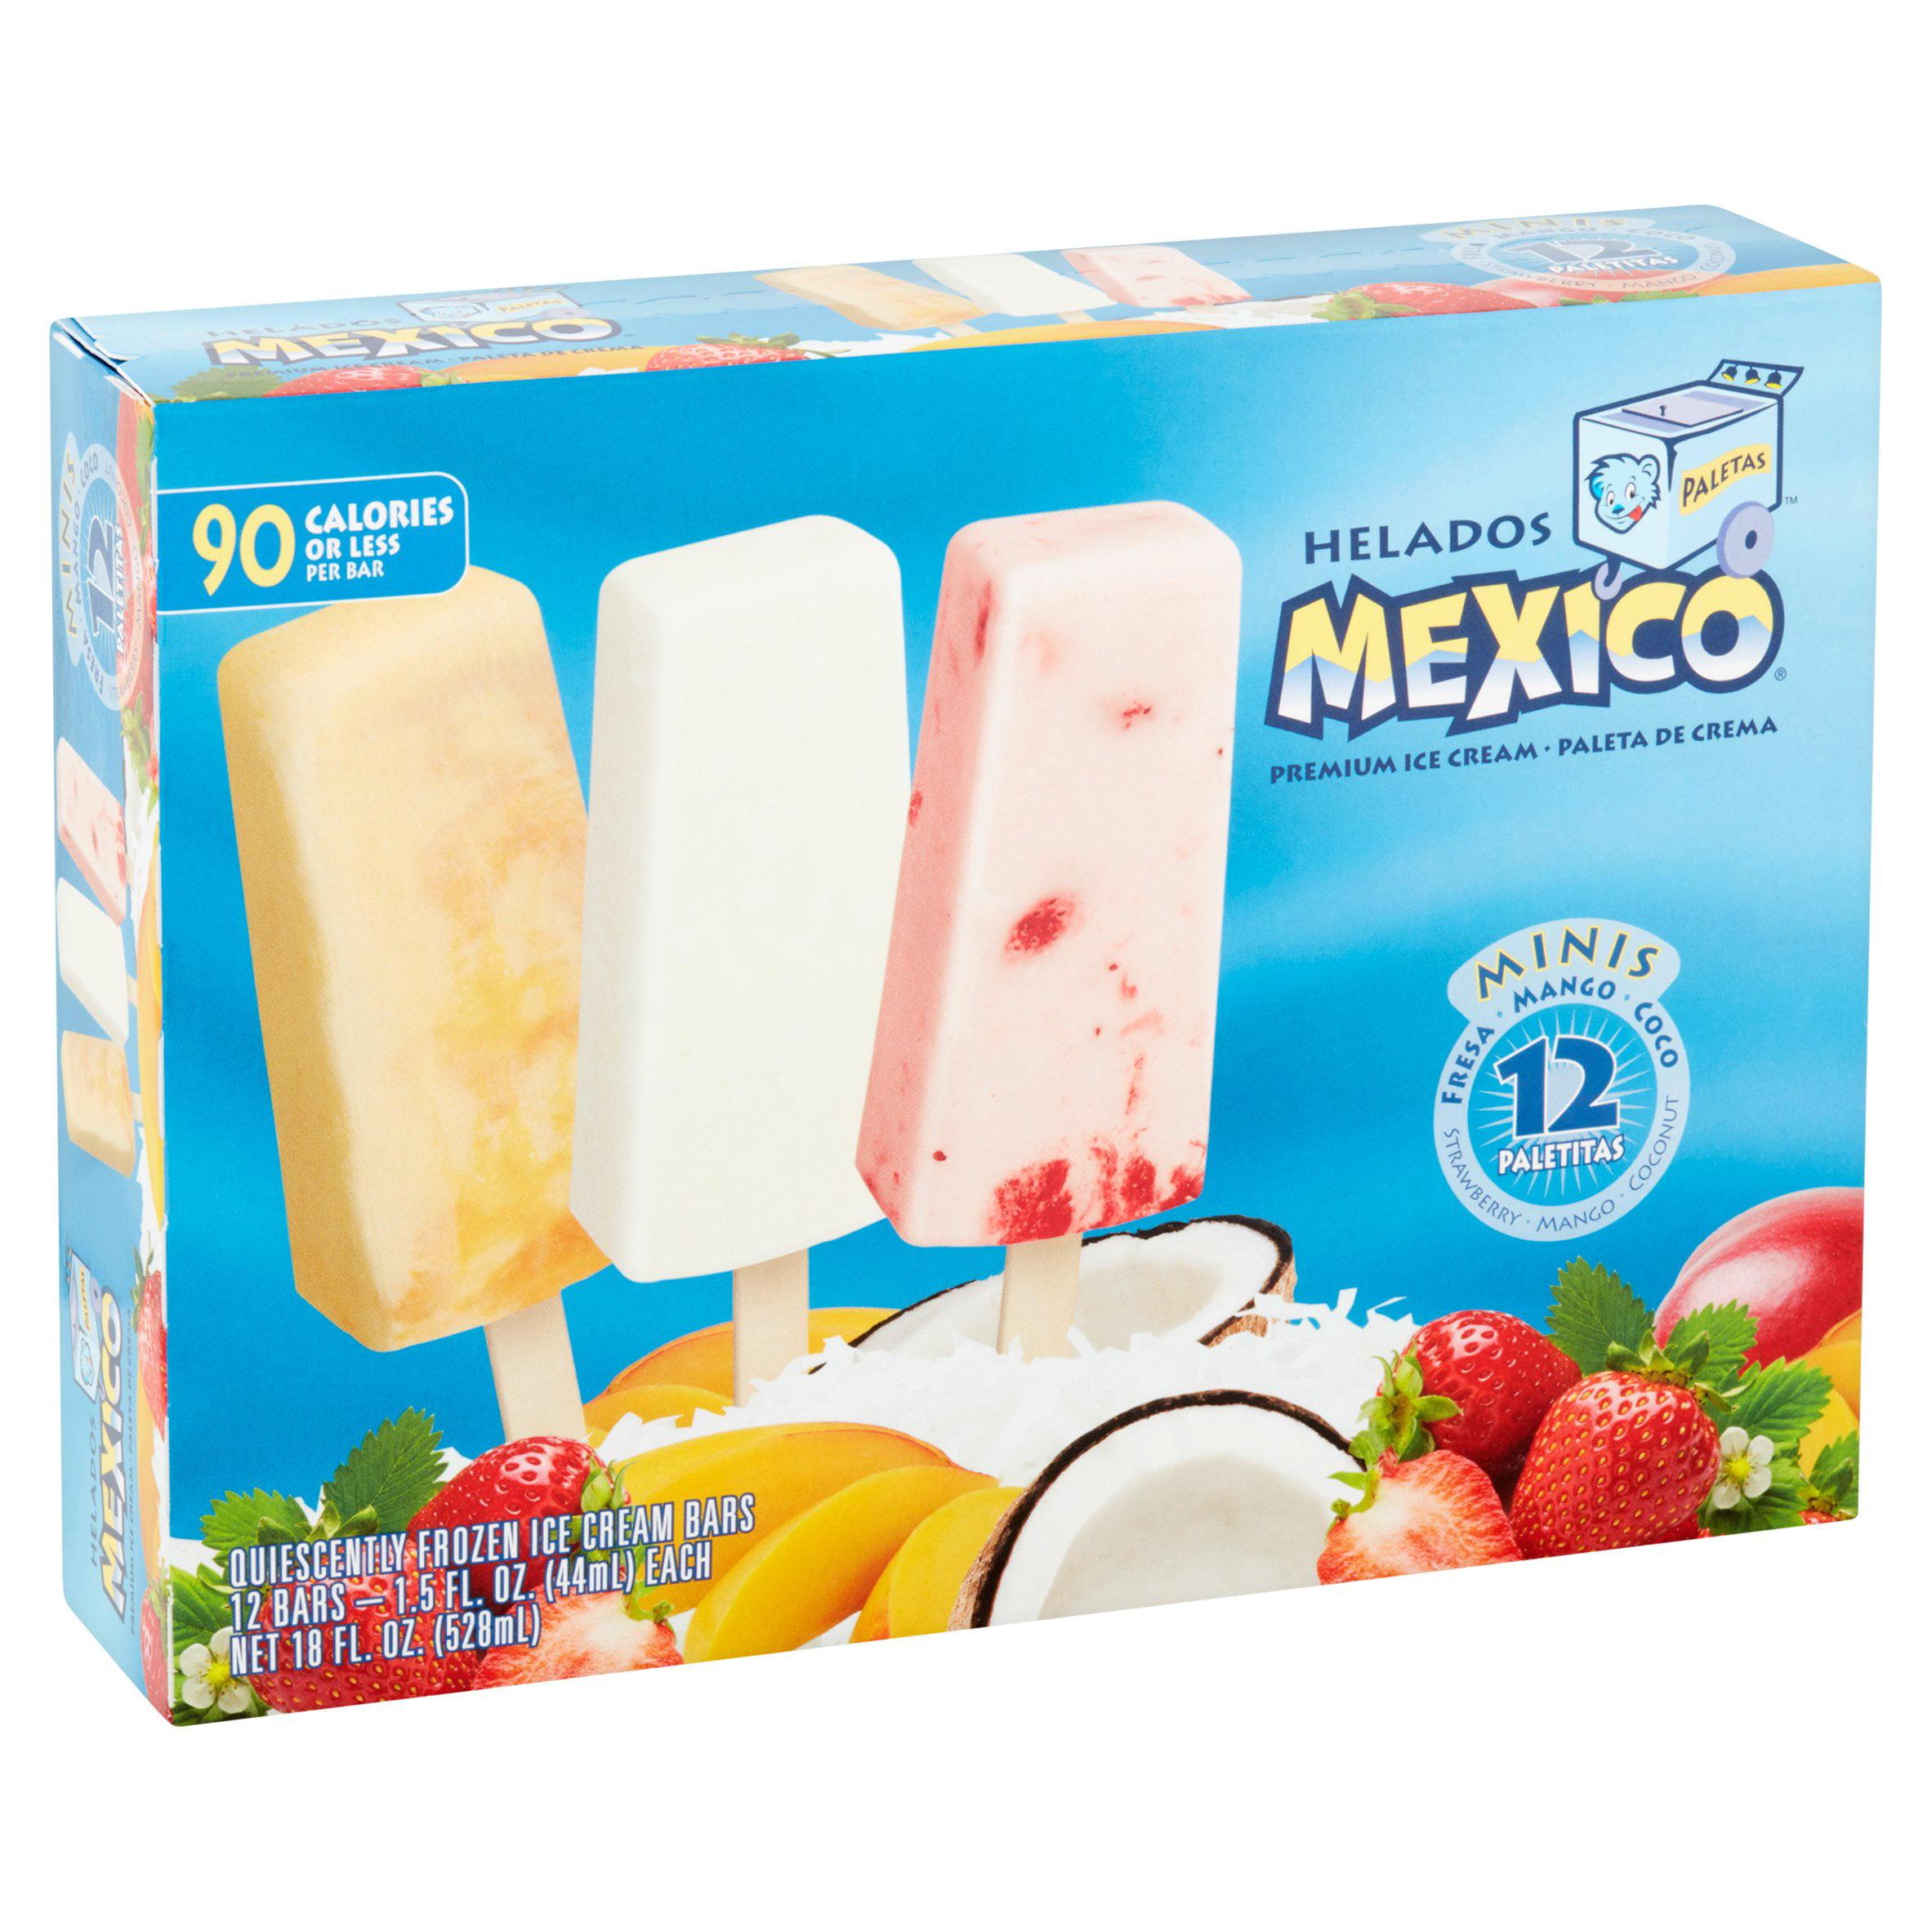 helados mexico assorted flavors minis ice cream bars 15 fl oz 12 ct walmartcom